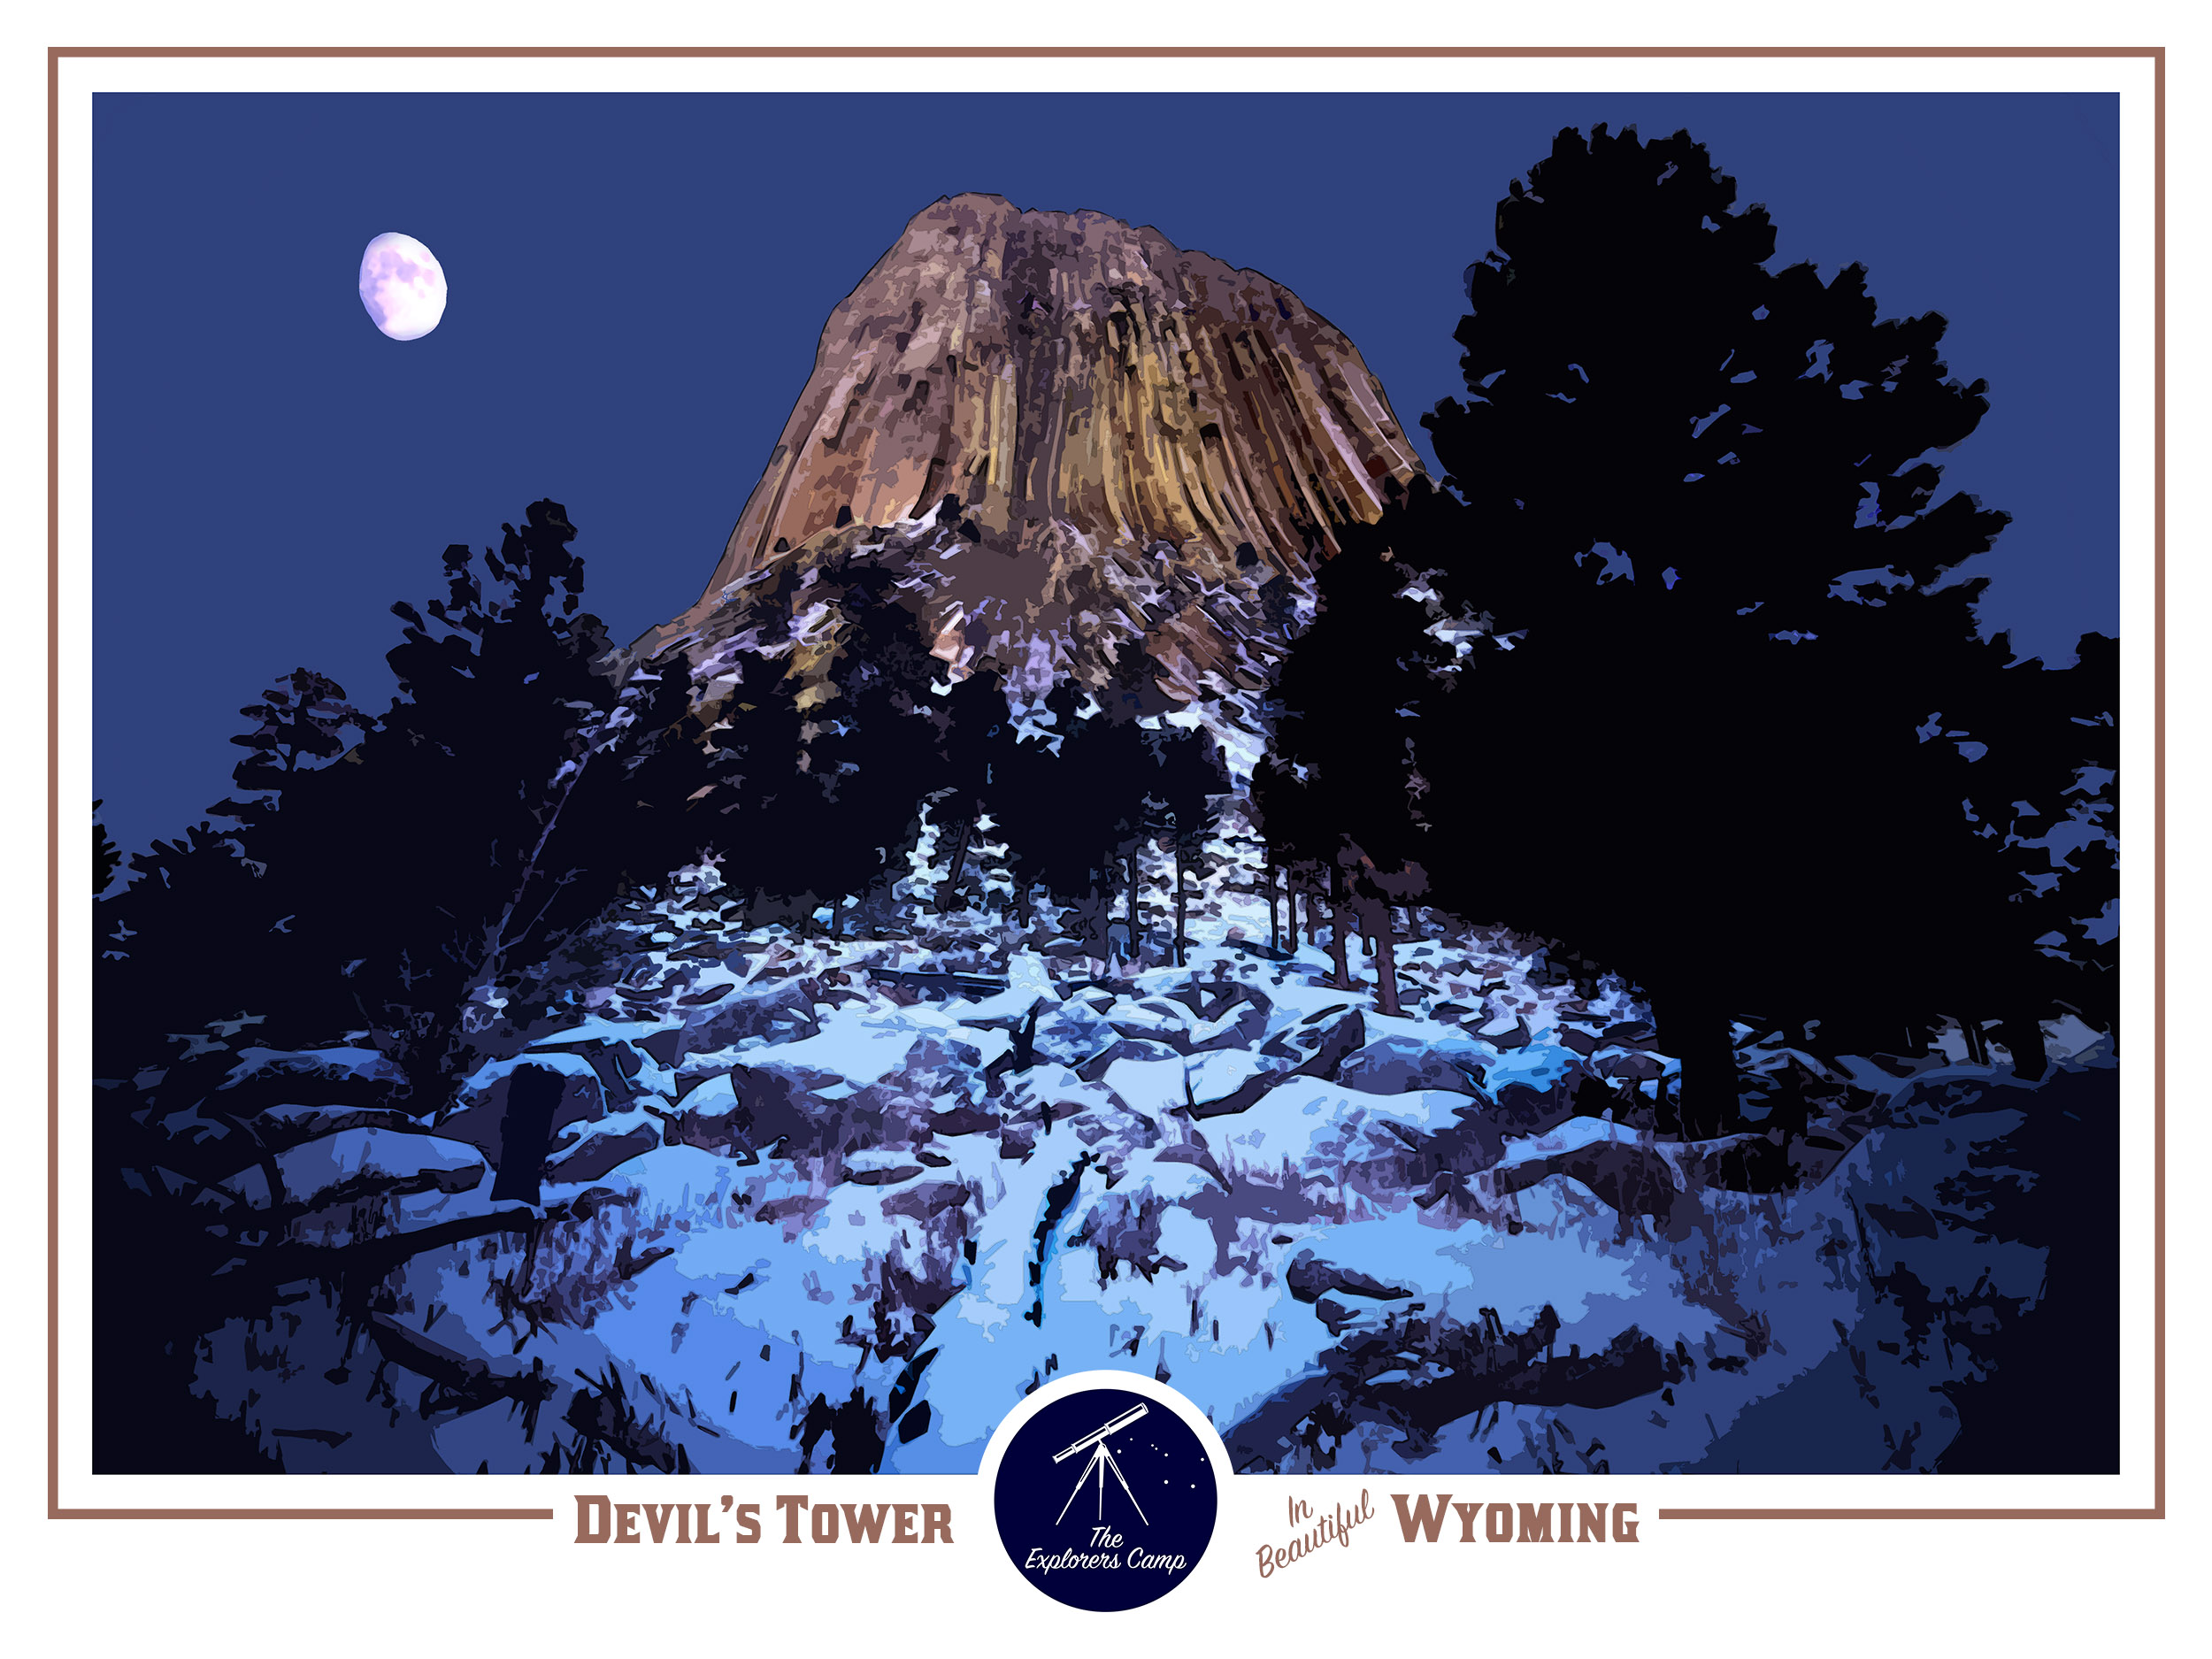 DevilsTower18x24.jpg